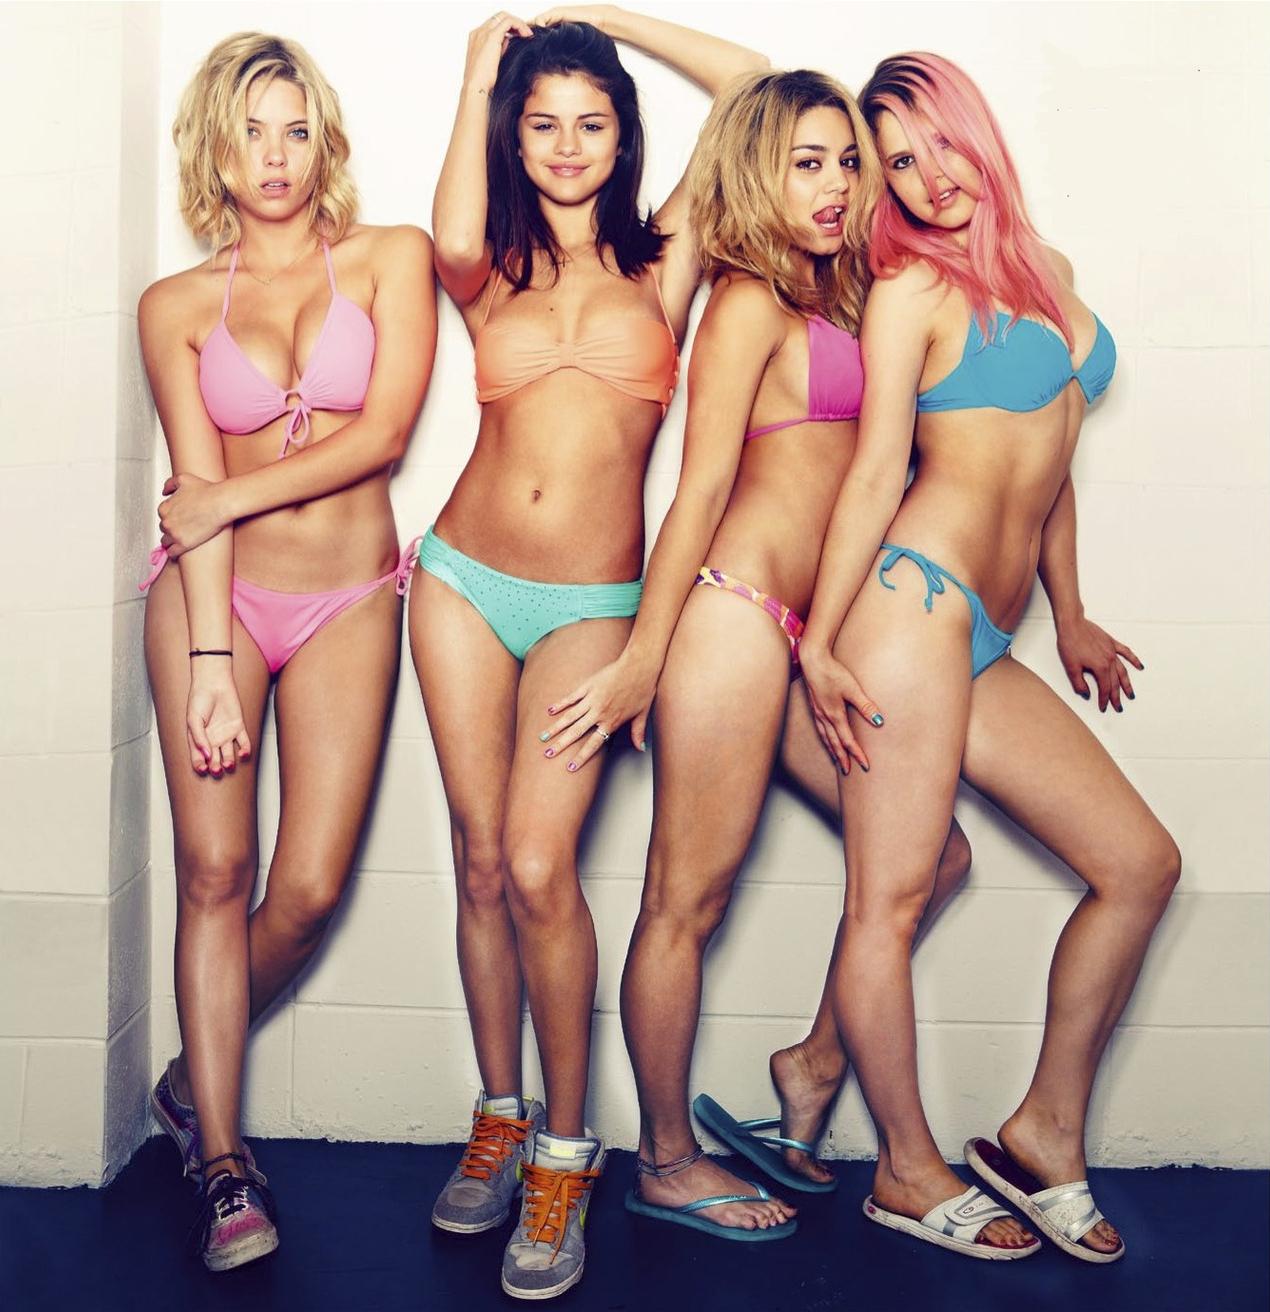 Vanessa Hudgens, Ashley Benson, Rachel Korine, Selena Gómez